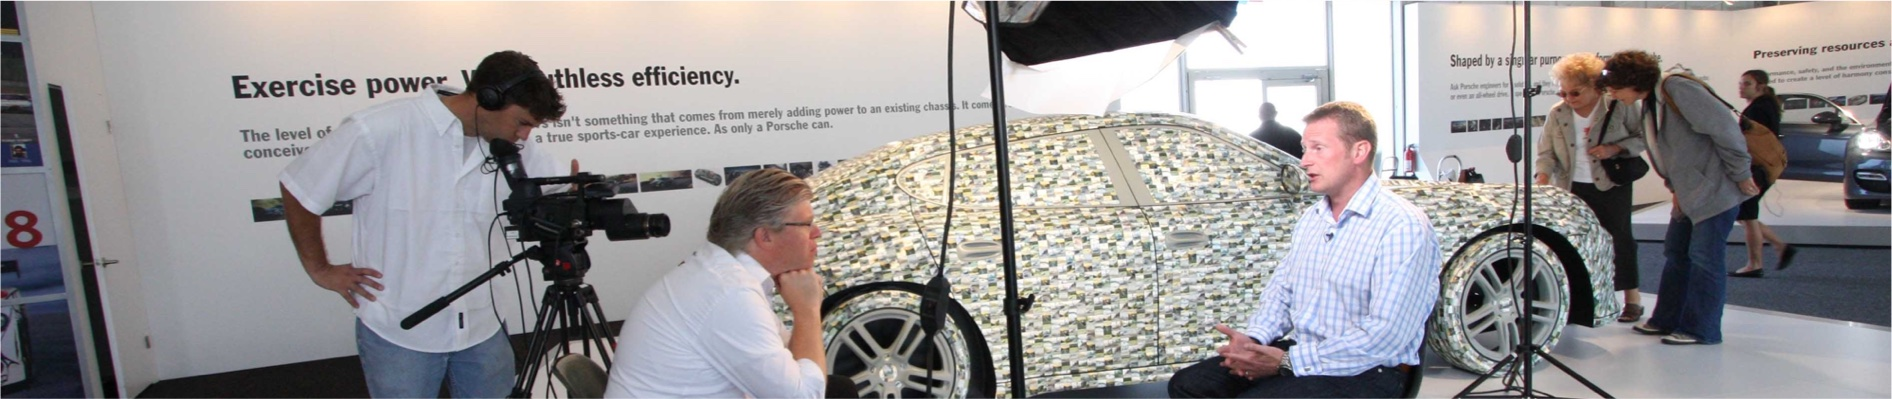 Porsche Video Shoot Monterey